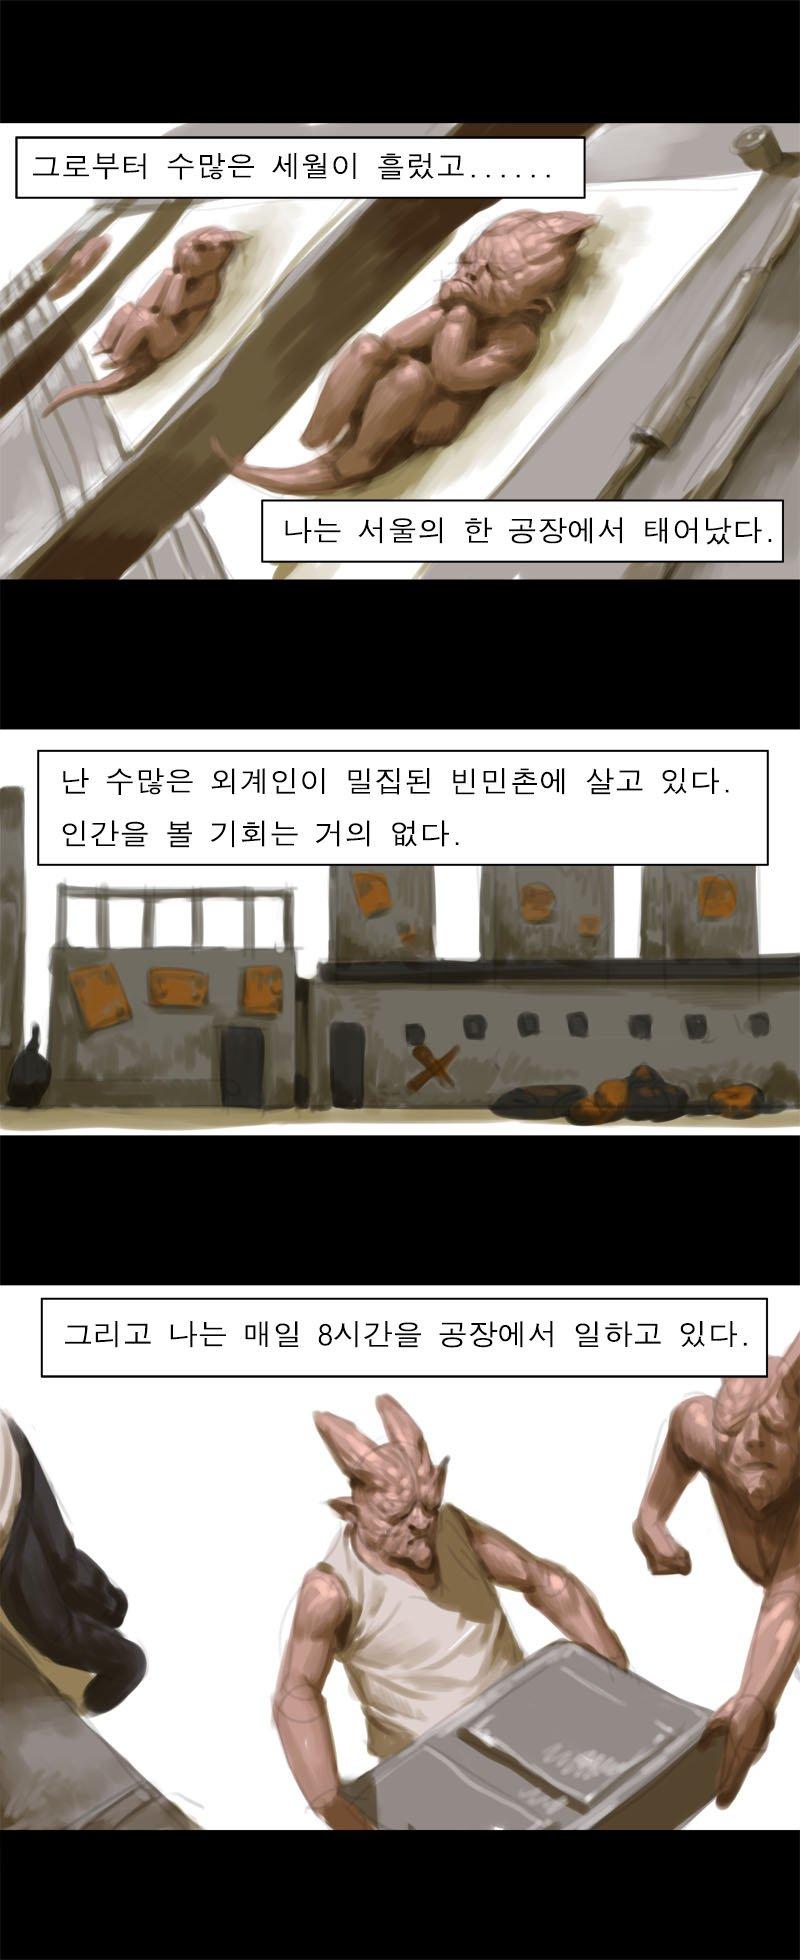 viewimage.php?id=2ebcc232eadd36&no=24b0d769e1d32ca73fed8ffa11d028317805b44c4c832ef9bd9f21ca3f3fa89d3d5abb4e410f7158d44a45b1a19b96046937270295bd699adffcbb8a8055e099f5e4d1